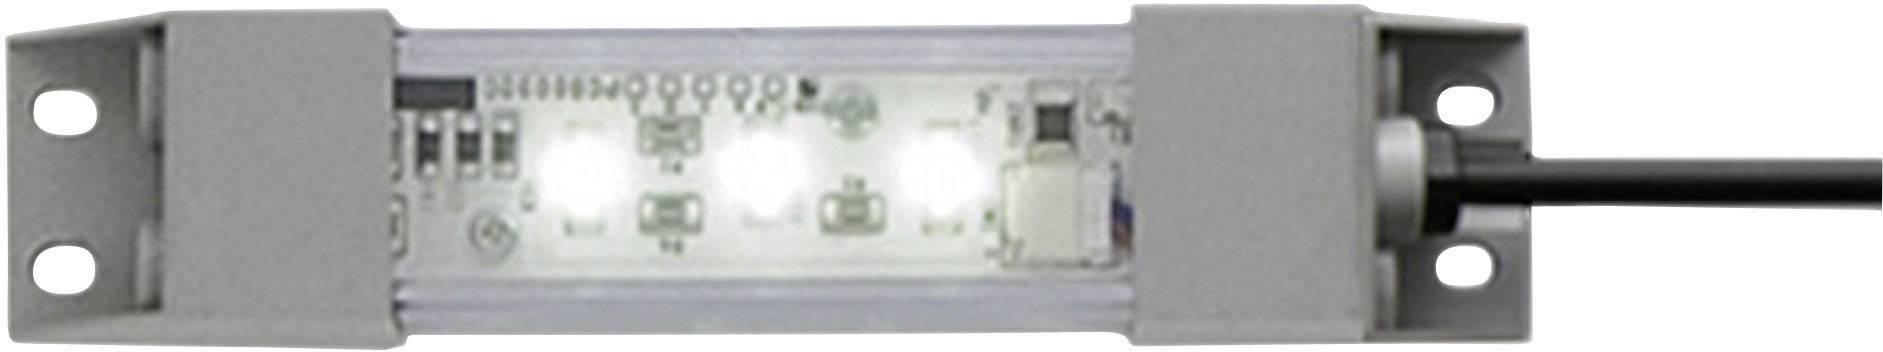 Idec LF1B-NA3P-2THWW2-3M, biela, 60 lm, 1.5 W, 24 V/DC